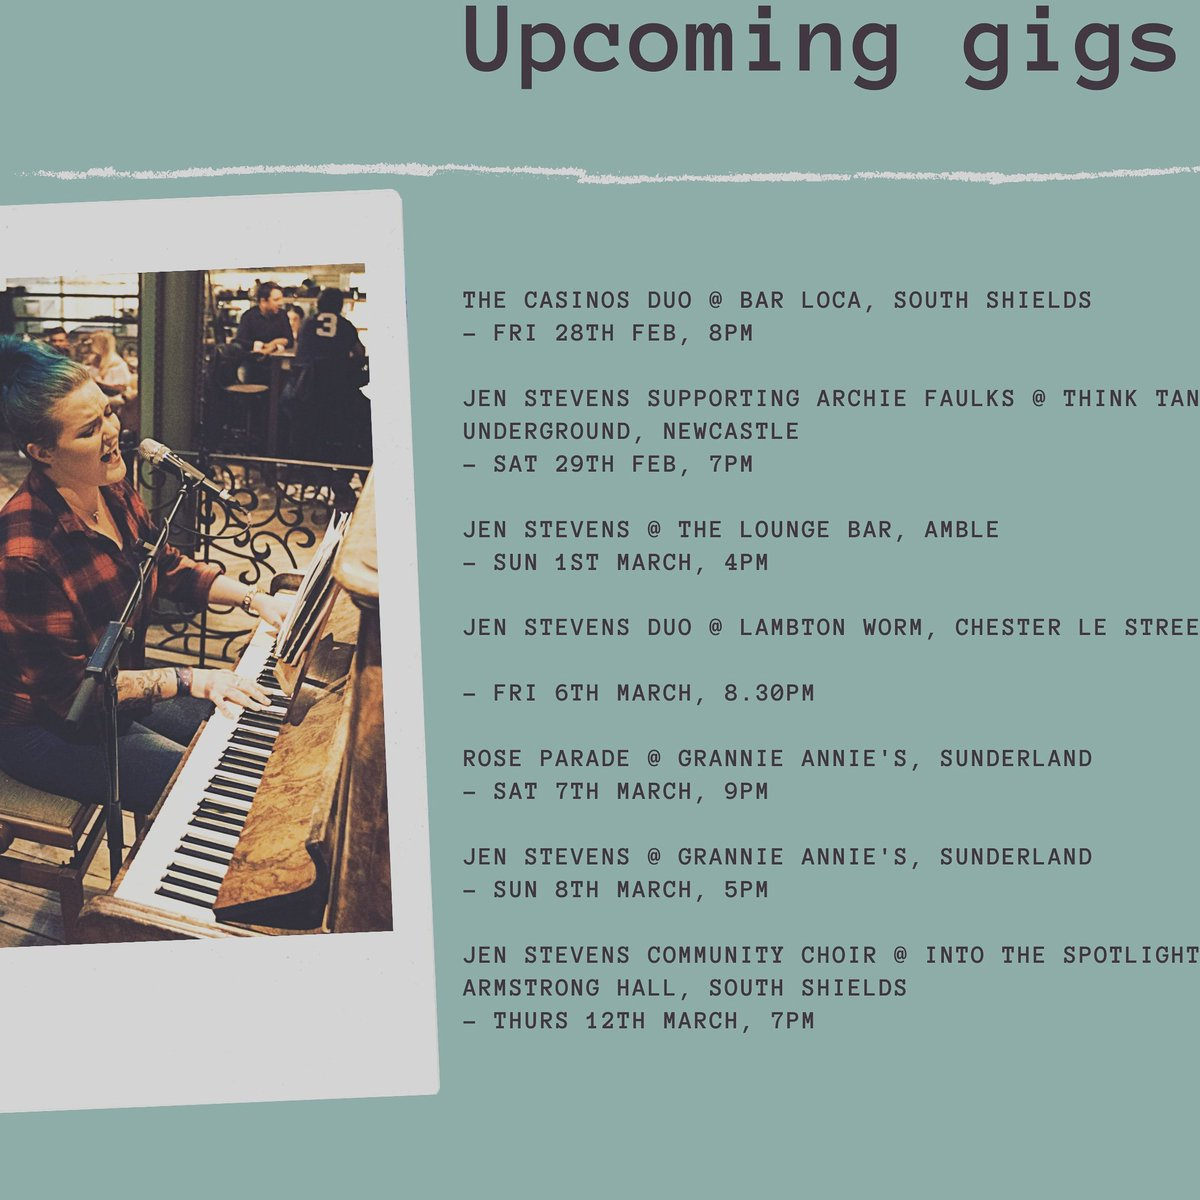 Upcoming gigs...  @archiefaulks  @TheLambton @GrannieAnniesPP  #livemusic #music #concert #live #singer #songwriter #pianist #piano #jenstevens #littleone #originalmusic #northeastmusic #newcastle #Sunderland #southshields #Amble #ukmusic #unsigned #giglist  📷 @JordanEmbleton_